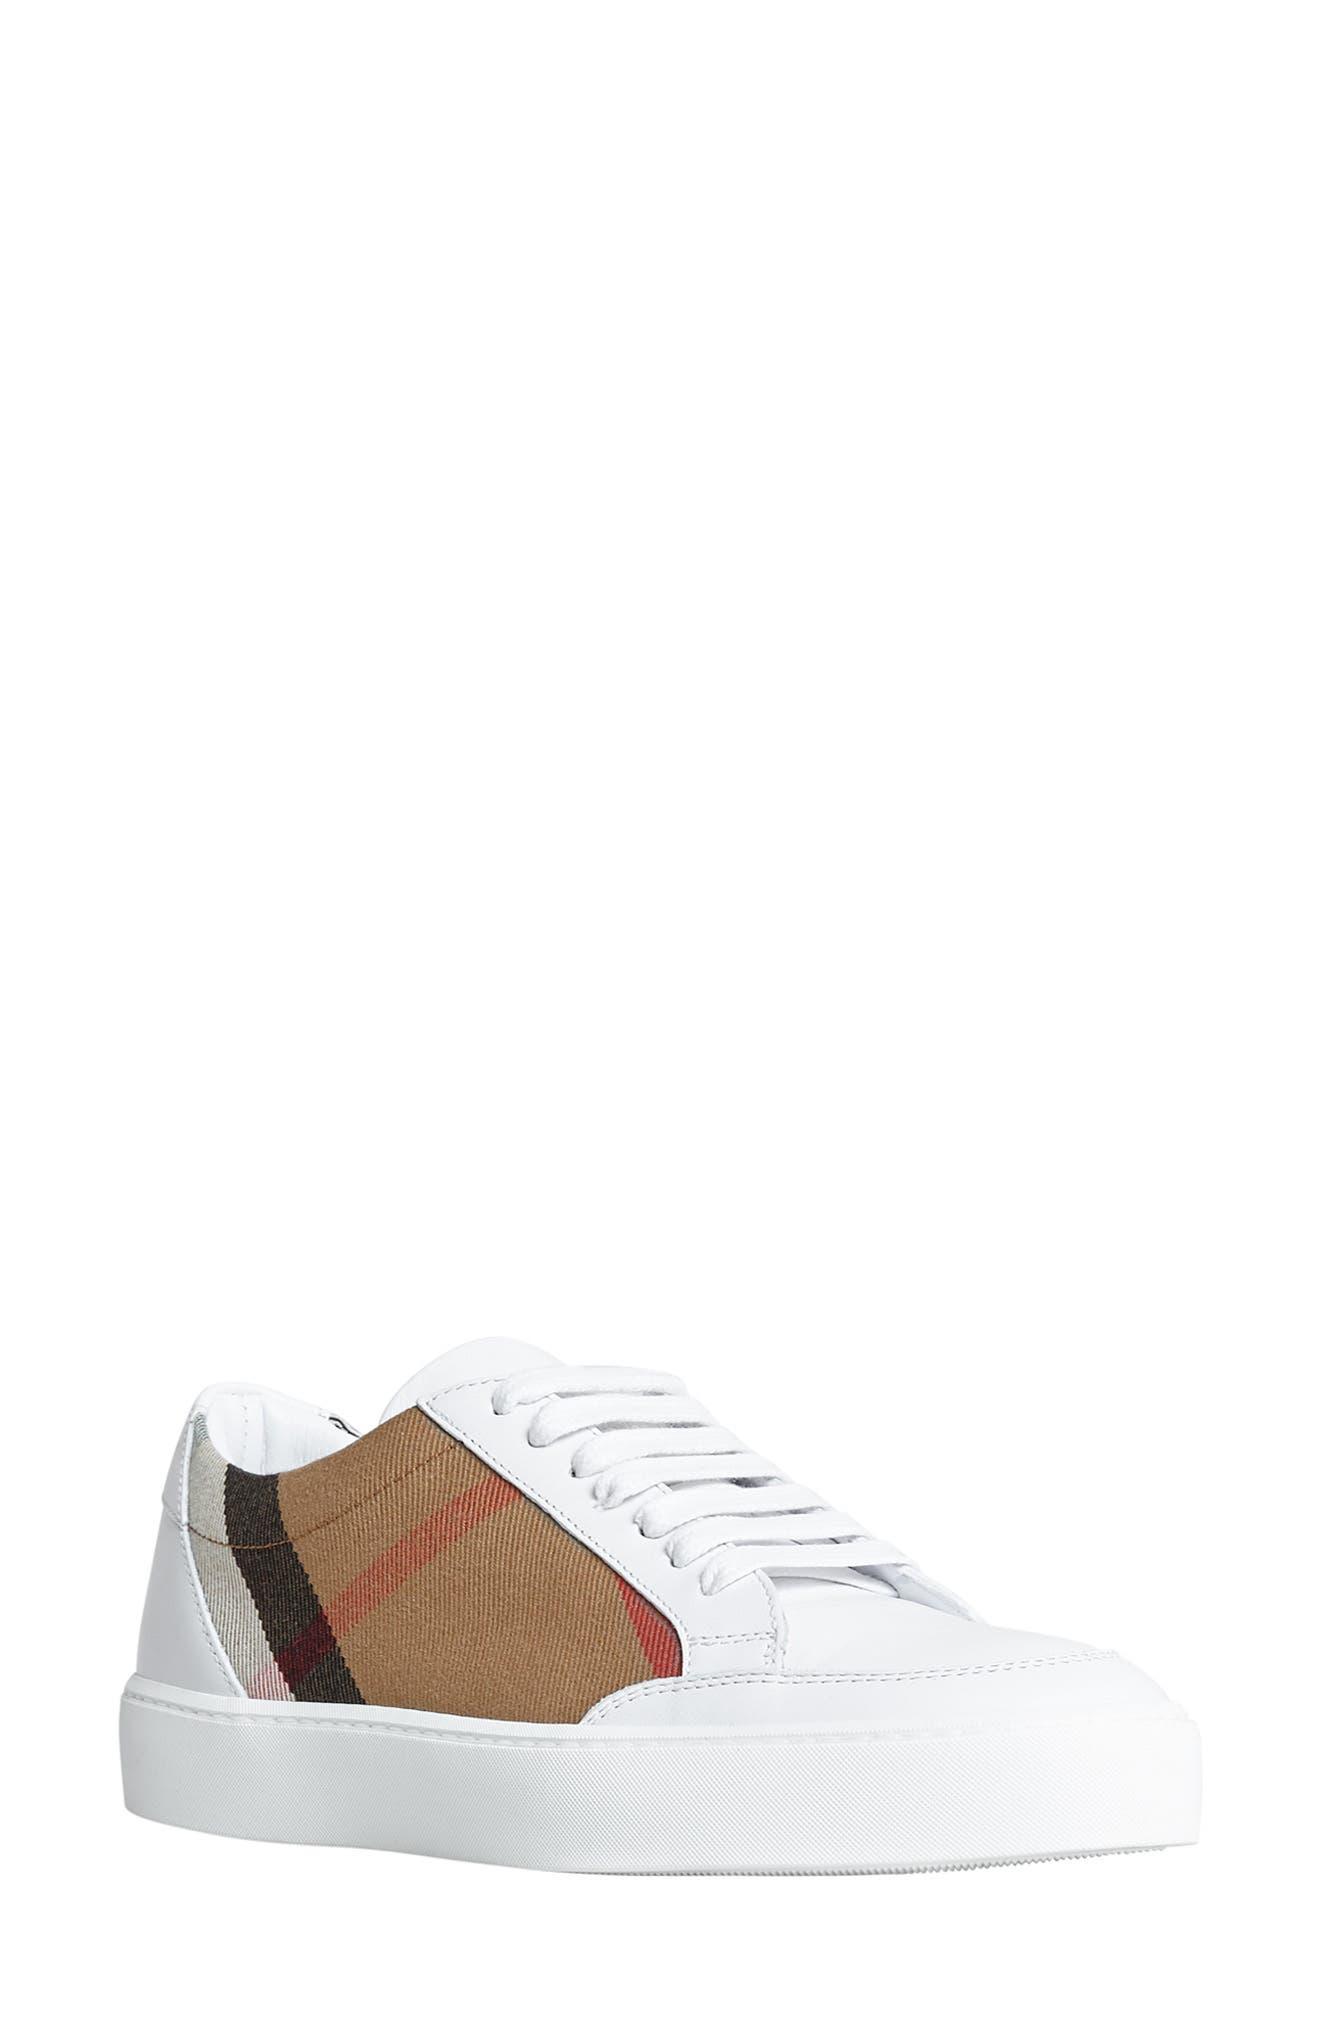 BURBERRY, Salmond Sneaker, Main thumbnail 1, color, WHITE